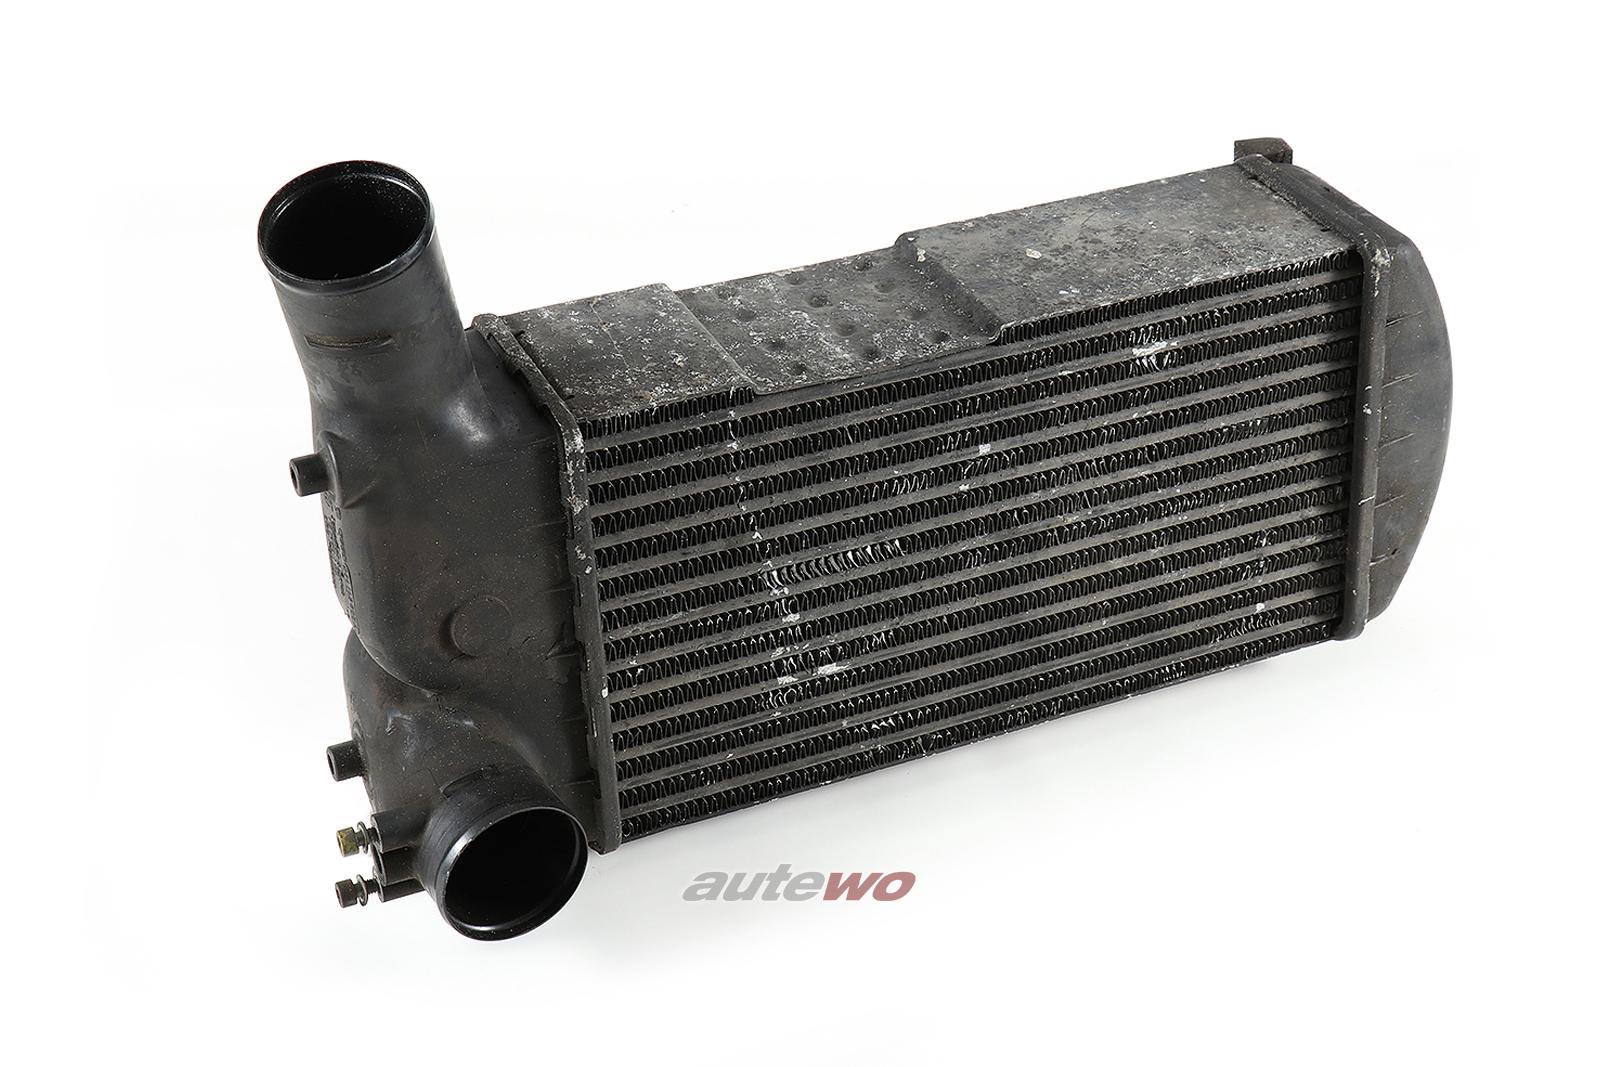 034145805A 035145805F Audi 100/200 Typ 44 2.2l 10V Turbo MC Ladeluftkühler